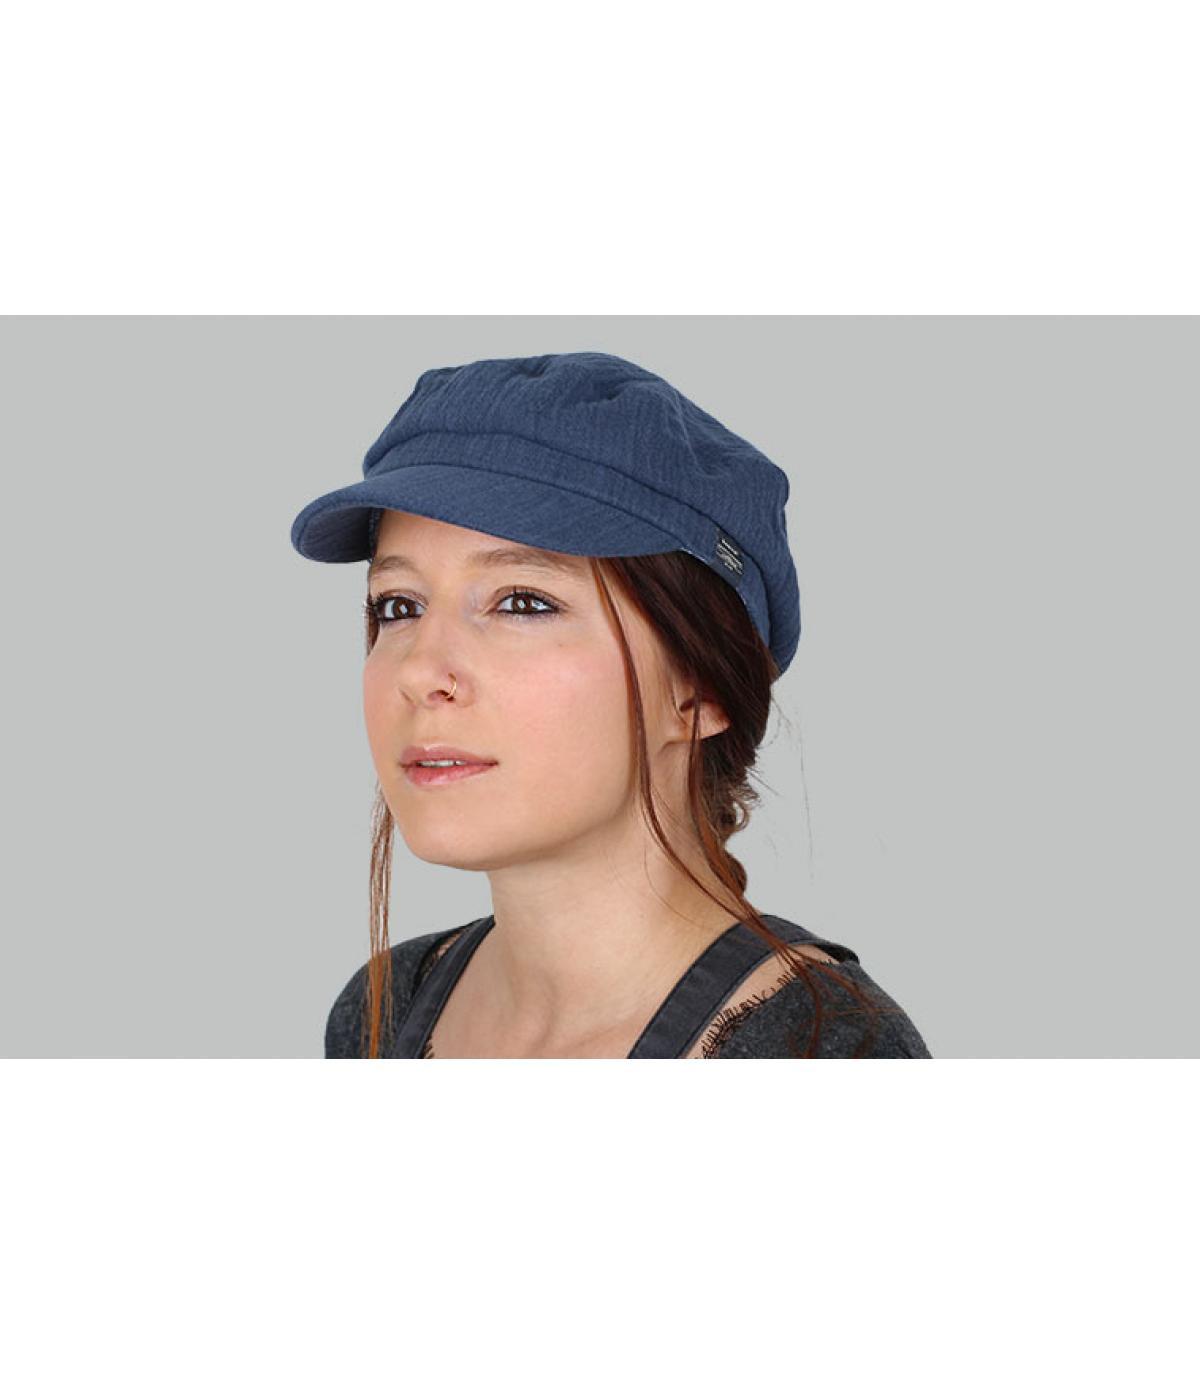 gorra marinera azul marino